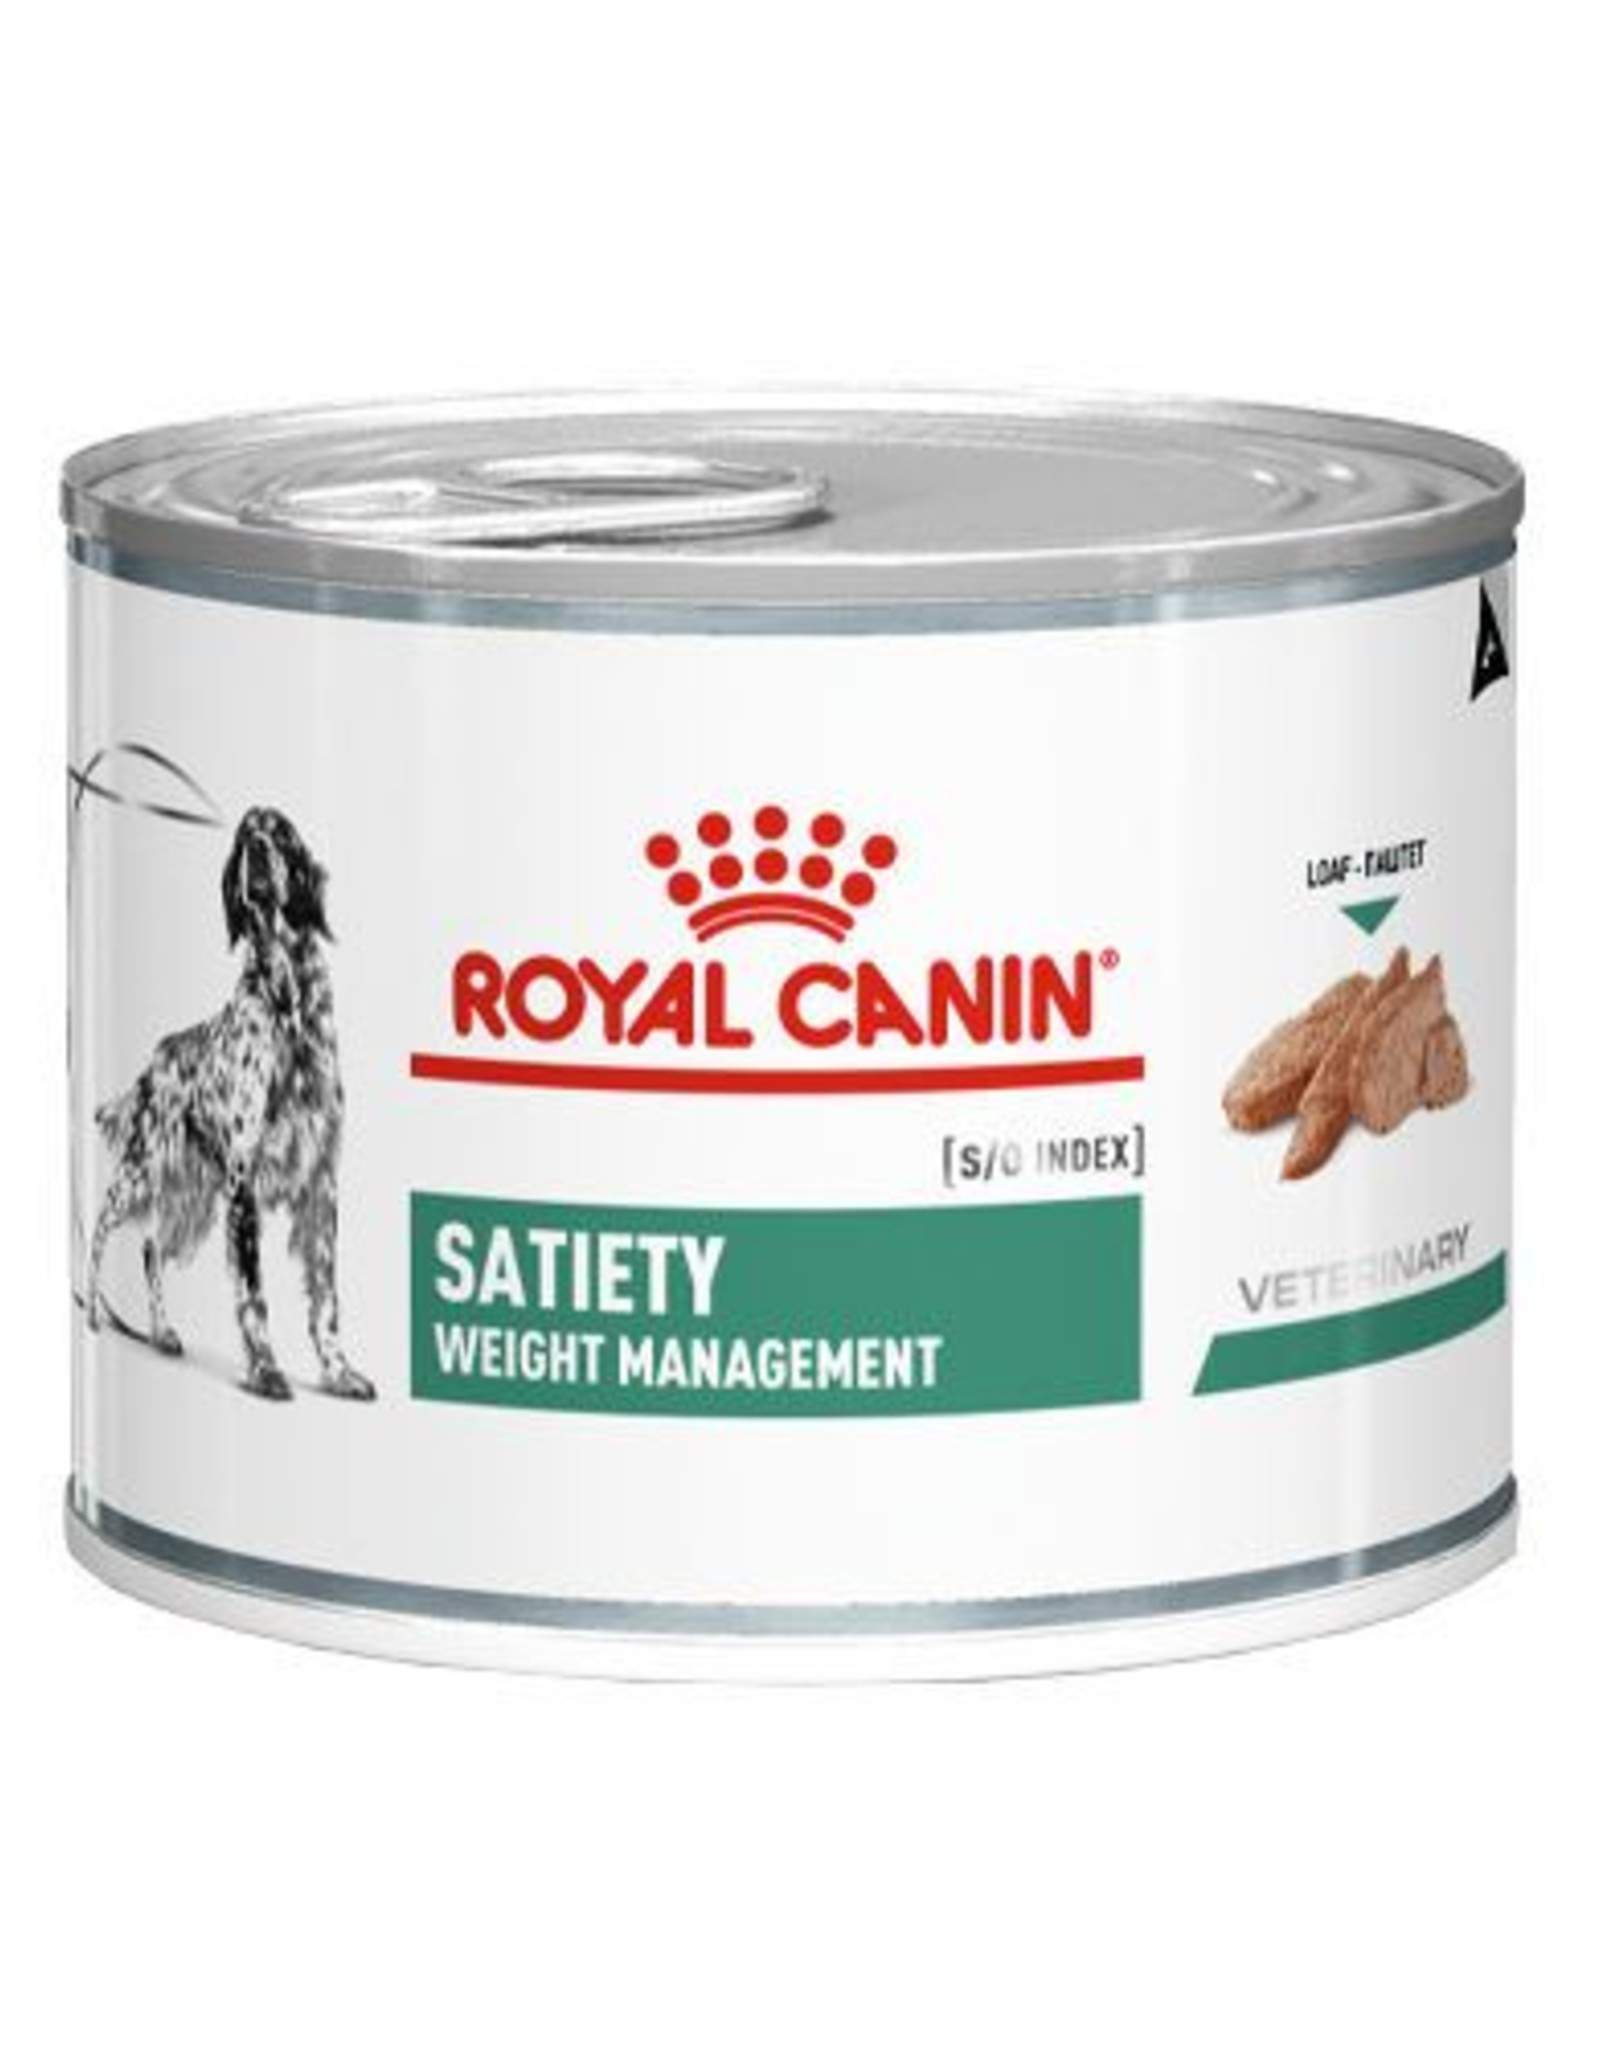 Royal Canin Royal Canin Vdiet Satiety Hund 12x195g